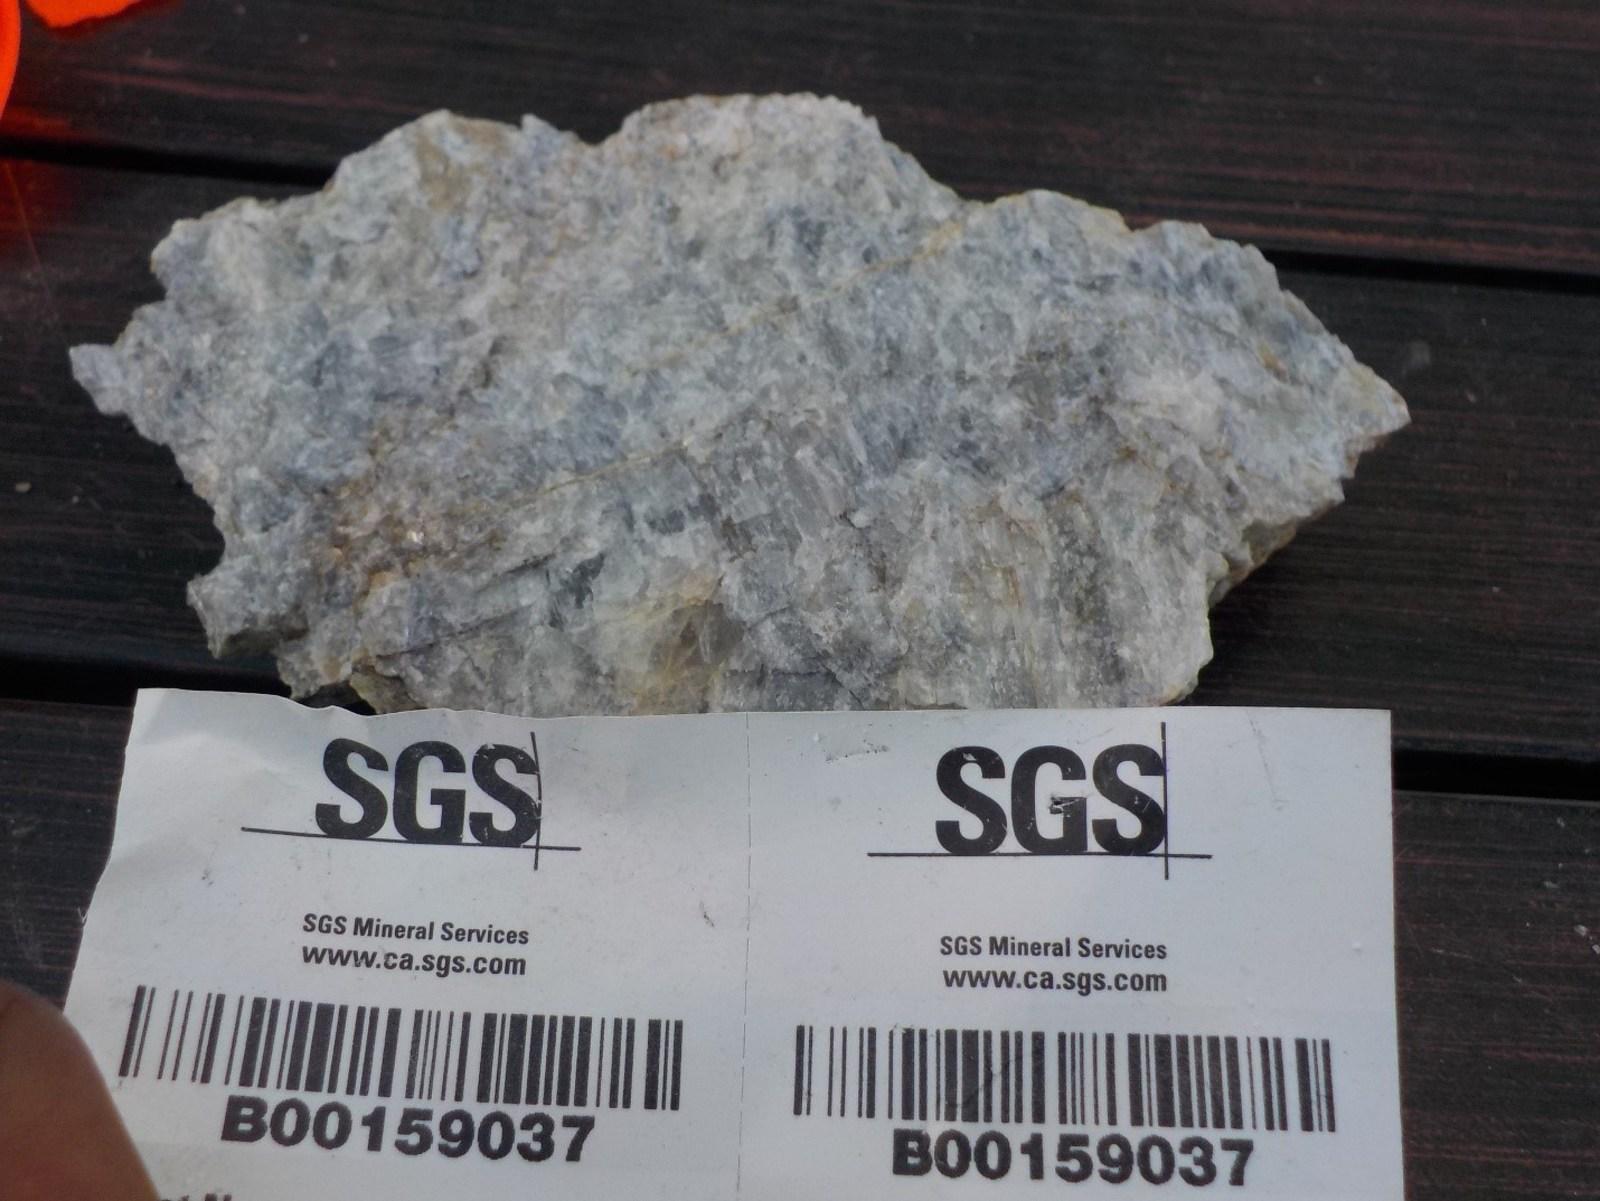 Figure 1 Grab sample 159037 of pure petalite with 4.43 % Li2O from Marko's pegmatite, Paterson Lake Property, Ontario.